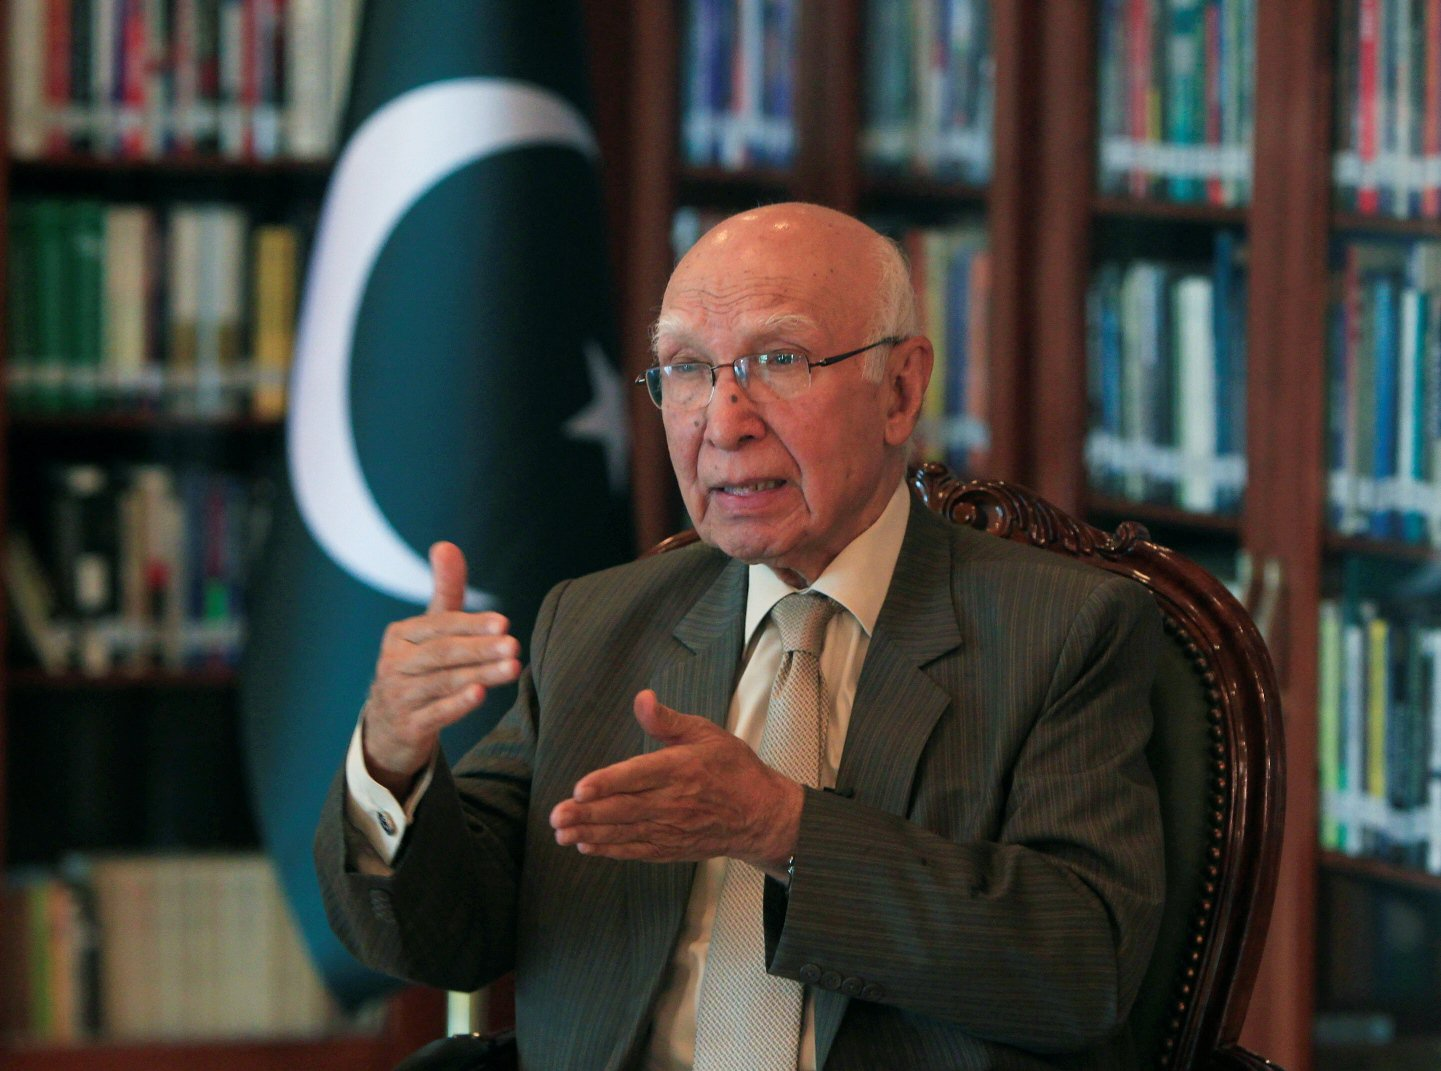 Planning Commission Chairman Sartaj Aziz. PHOTO: Reuters